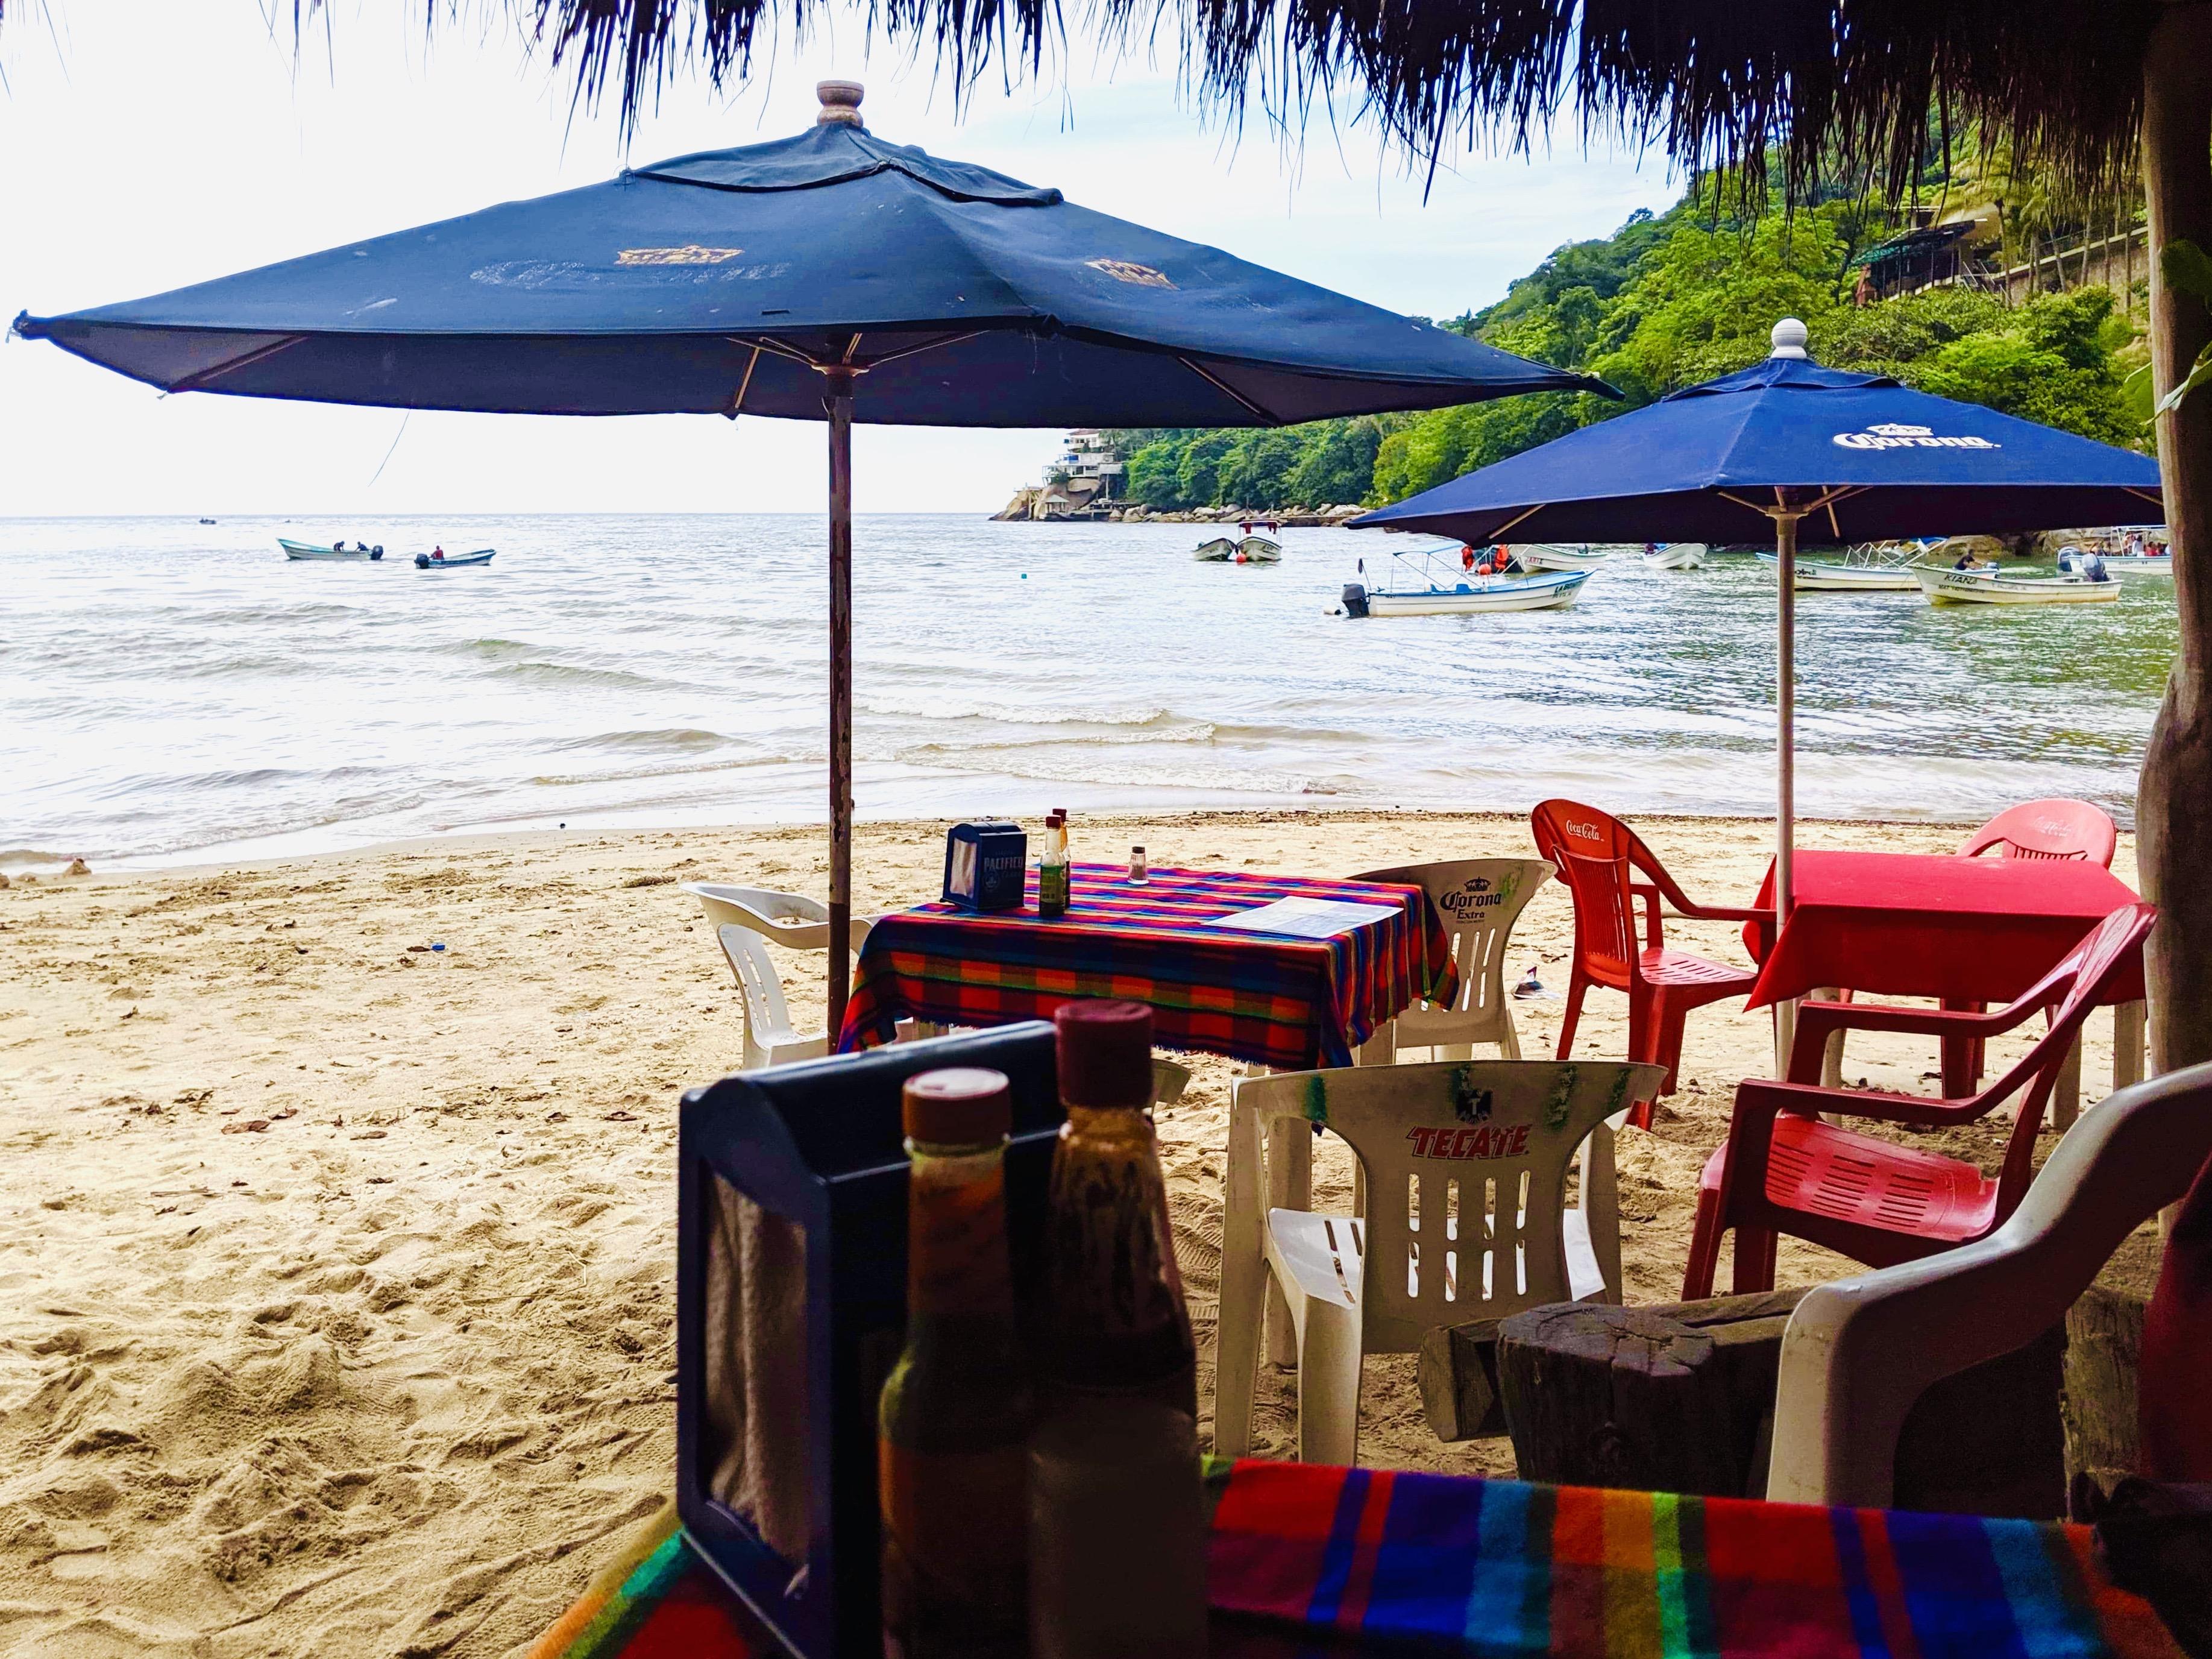 Beach side restaurant tables, with the beach of Boca de Tomatlan